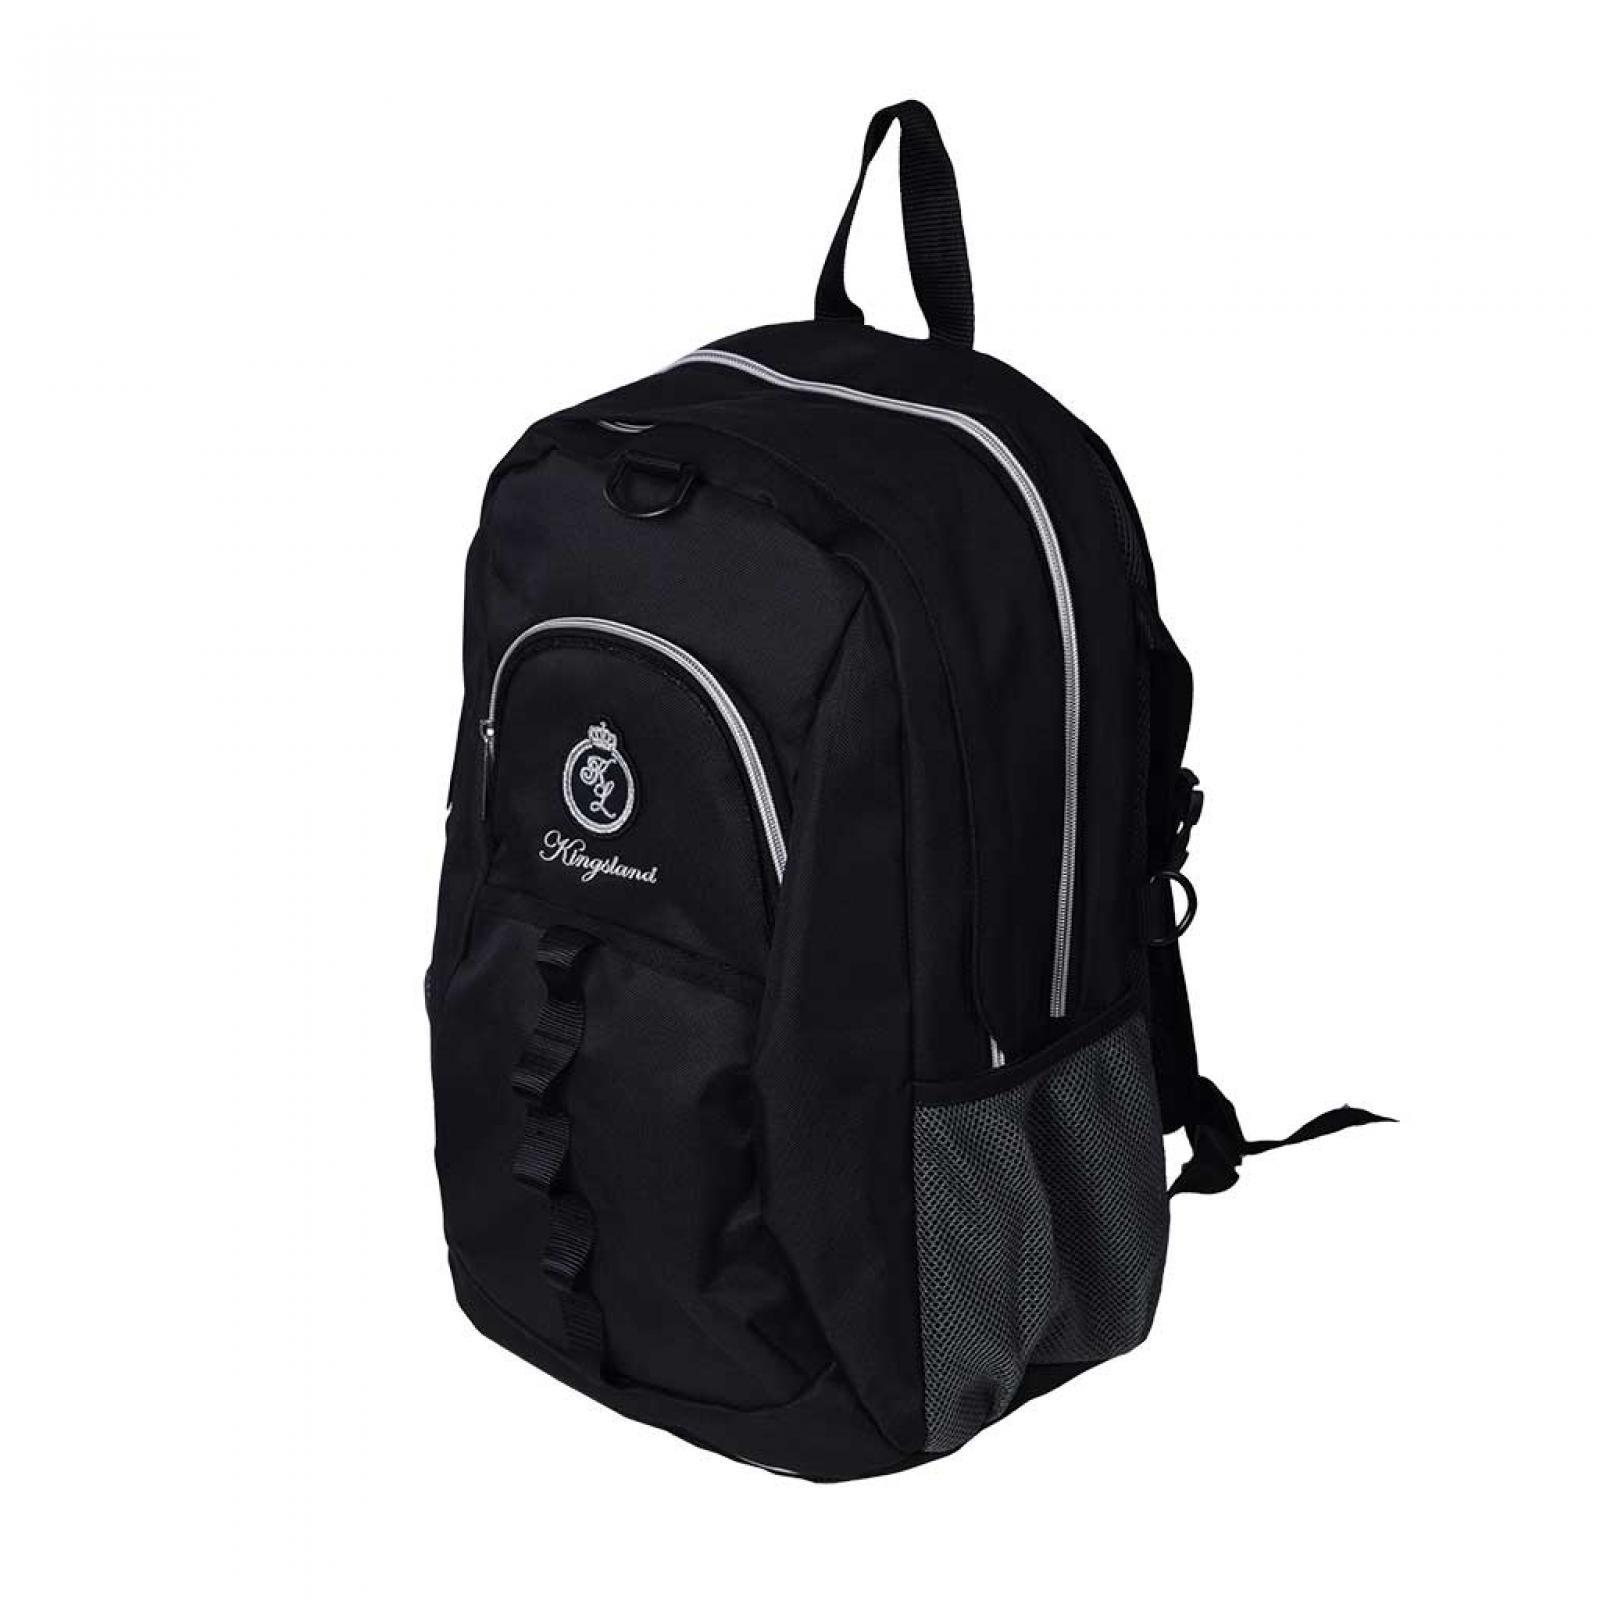 KINGSLAND Kingsland Maxime backpack black/zwart